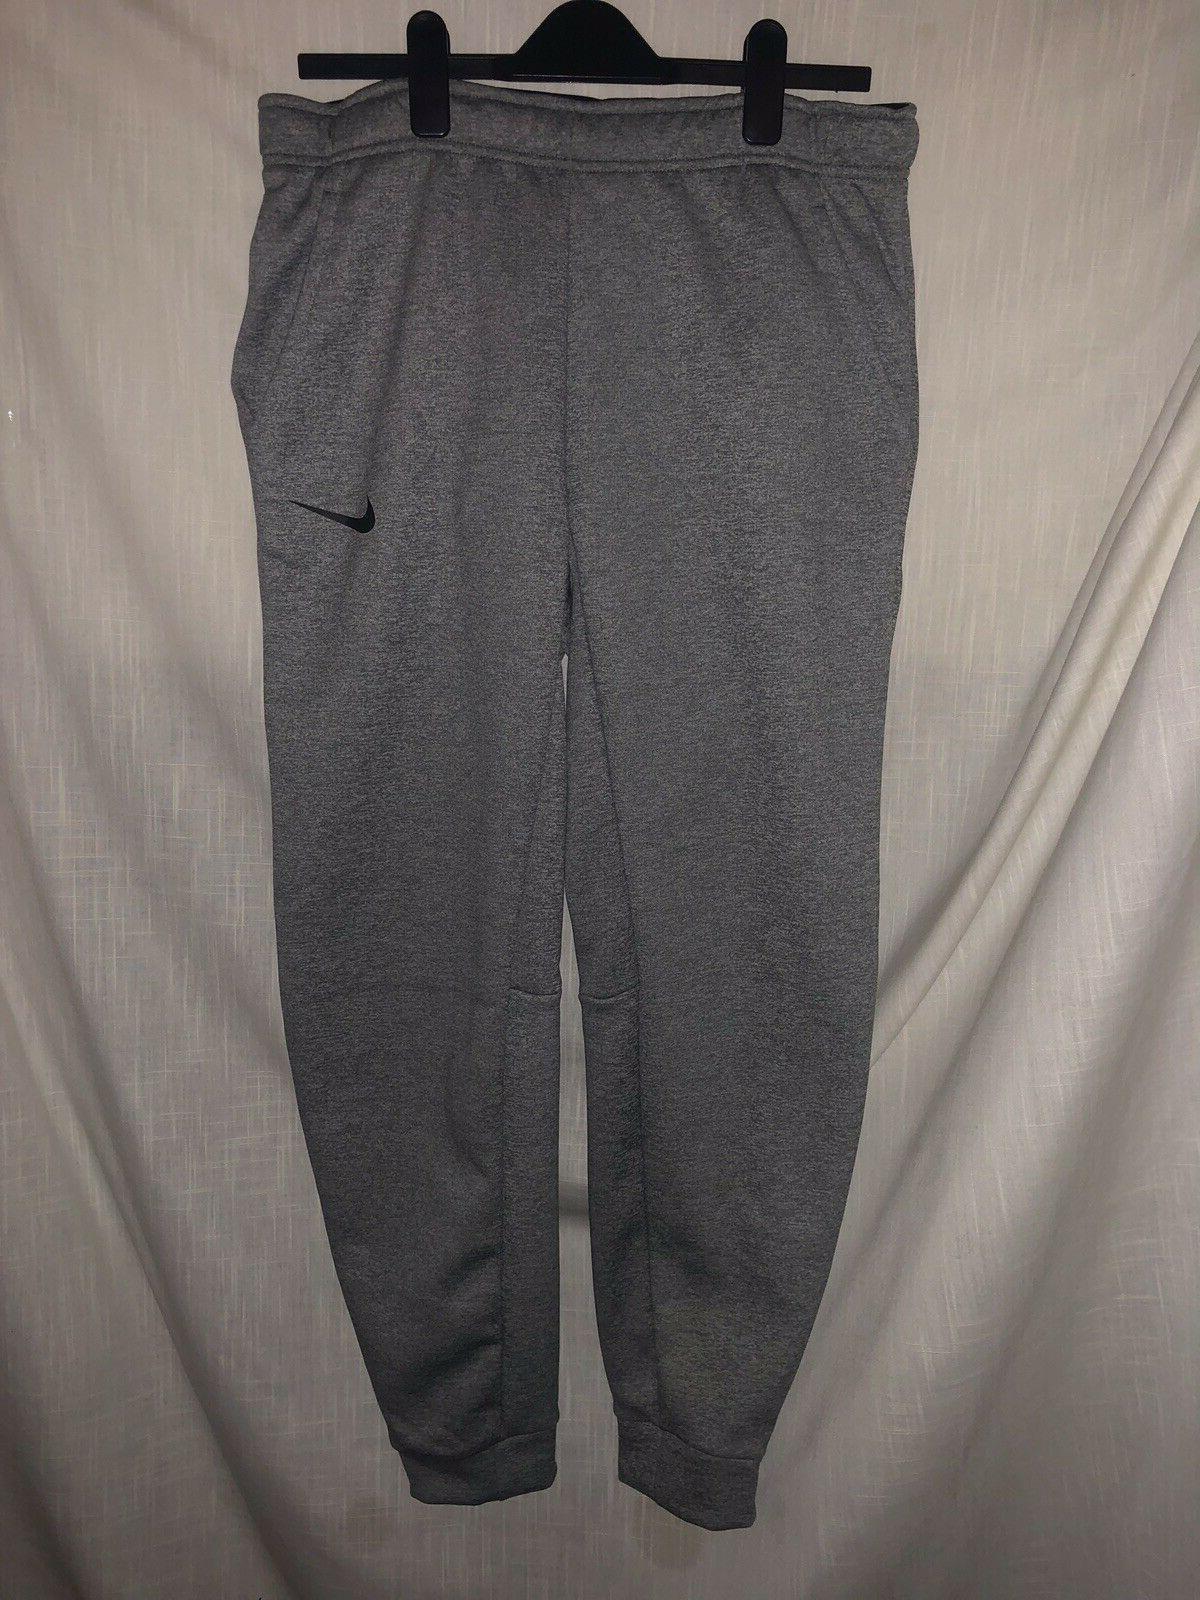 Nike Dri-fit Suit Grey